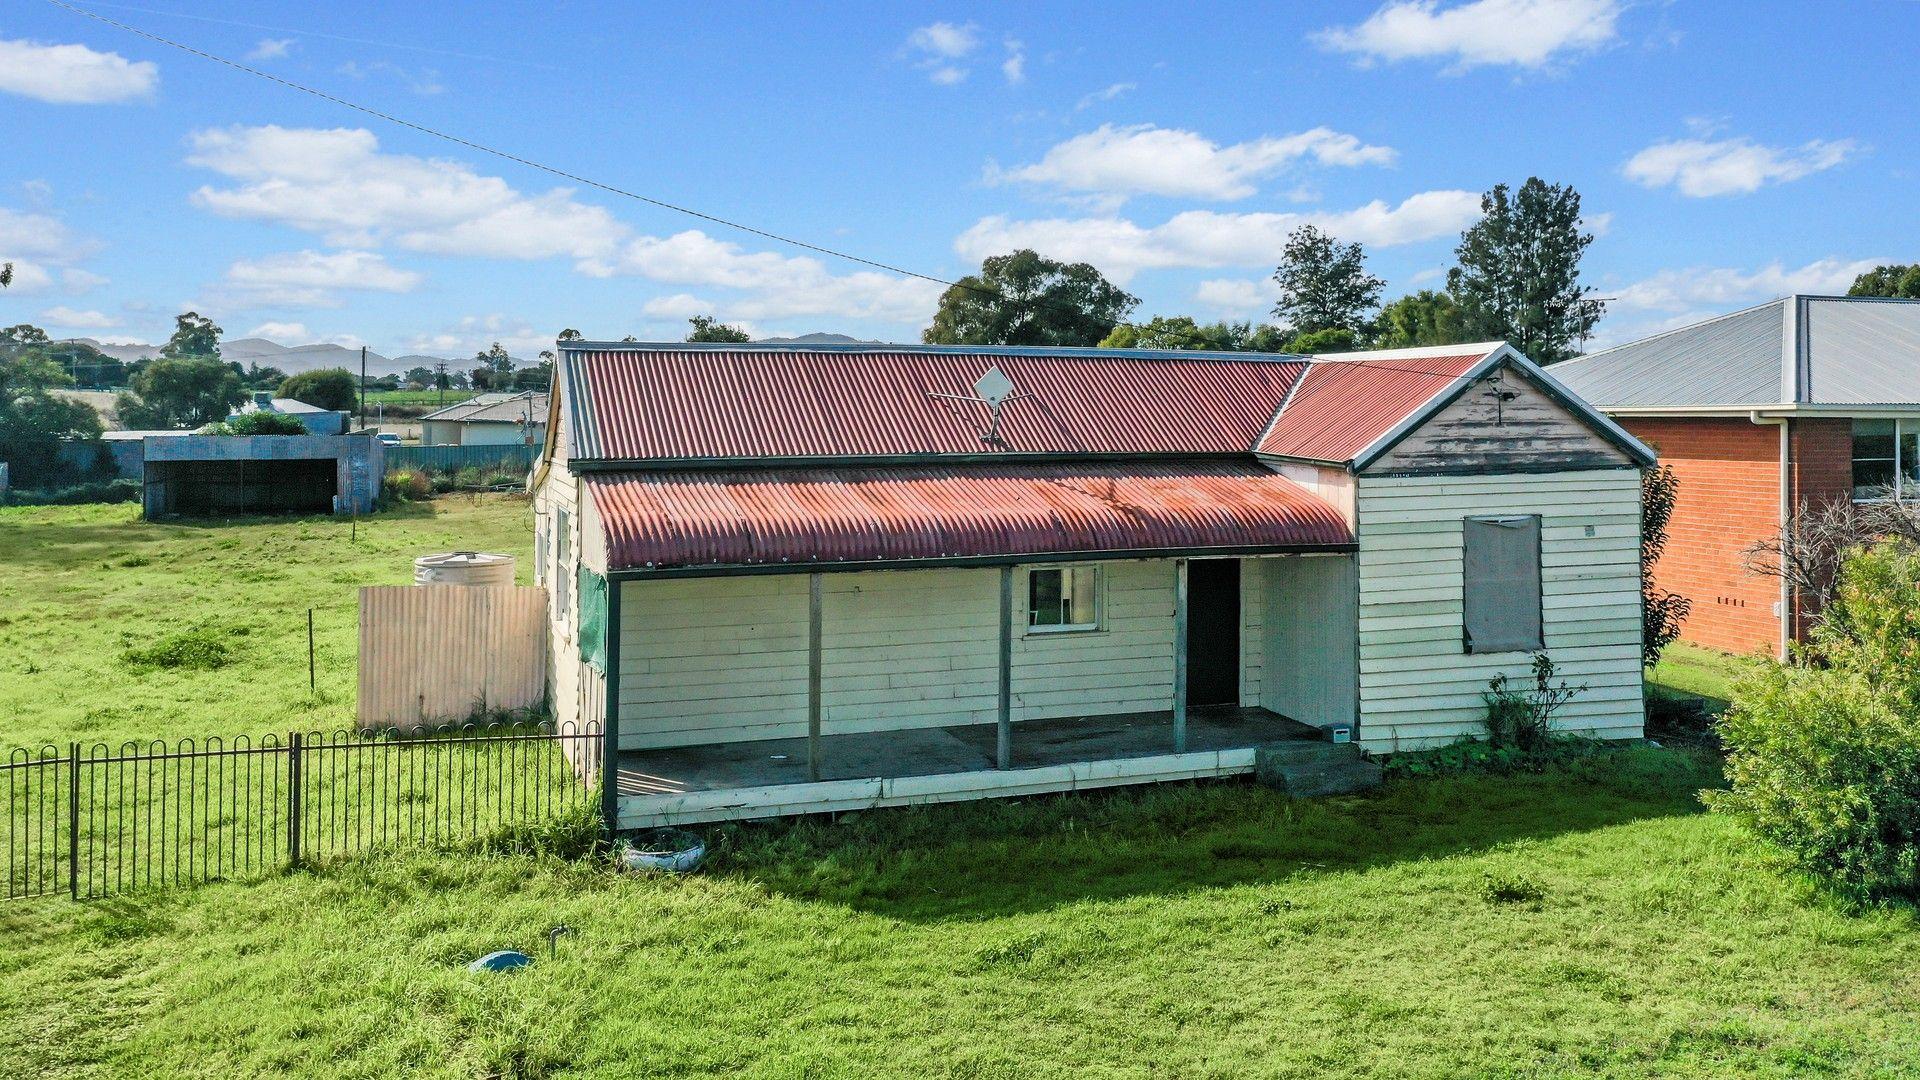 20-22 Underwood Street, Quirindi NSW 2343, Image 0